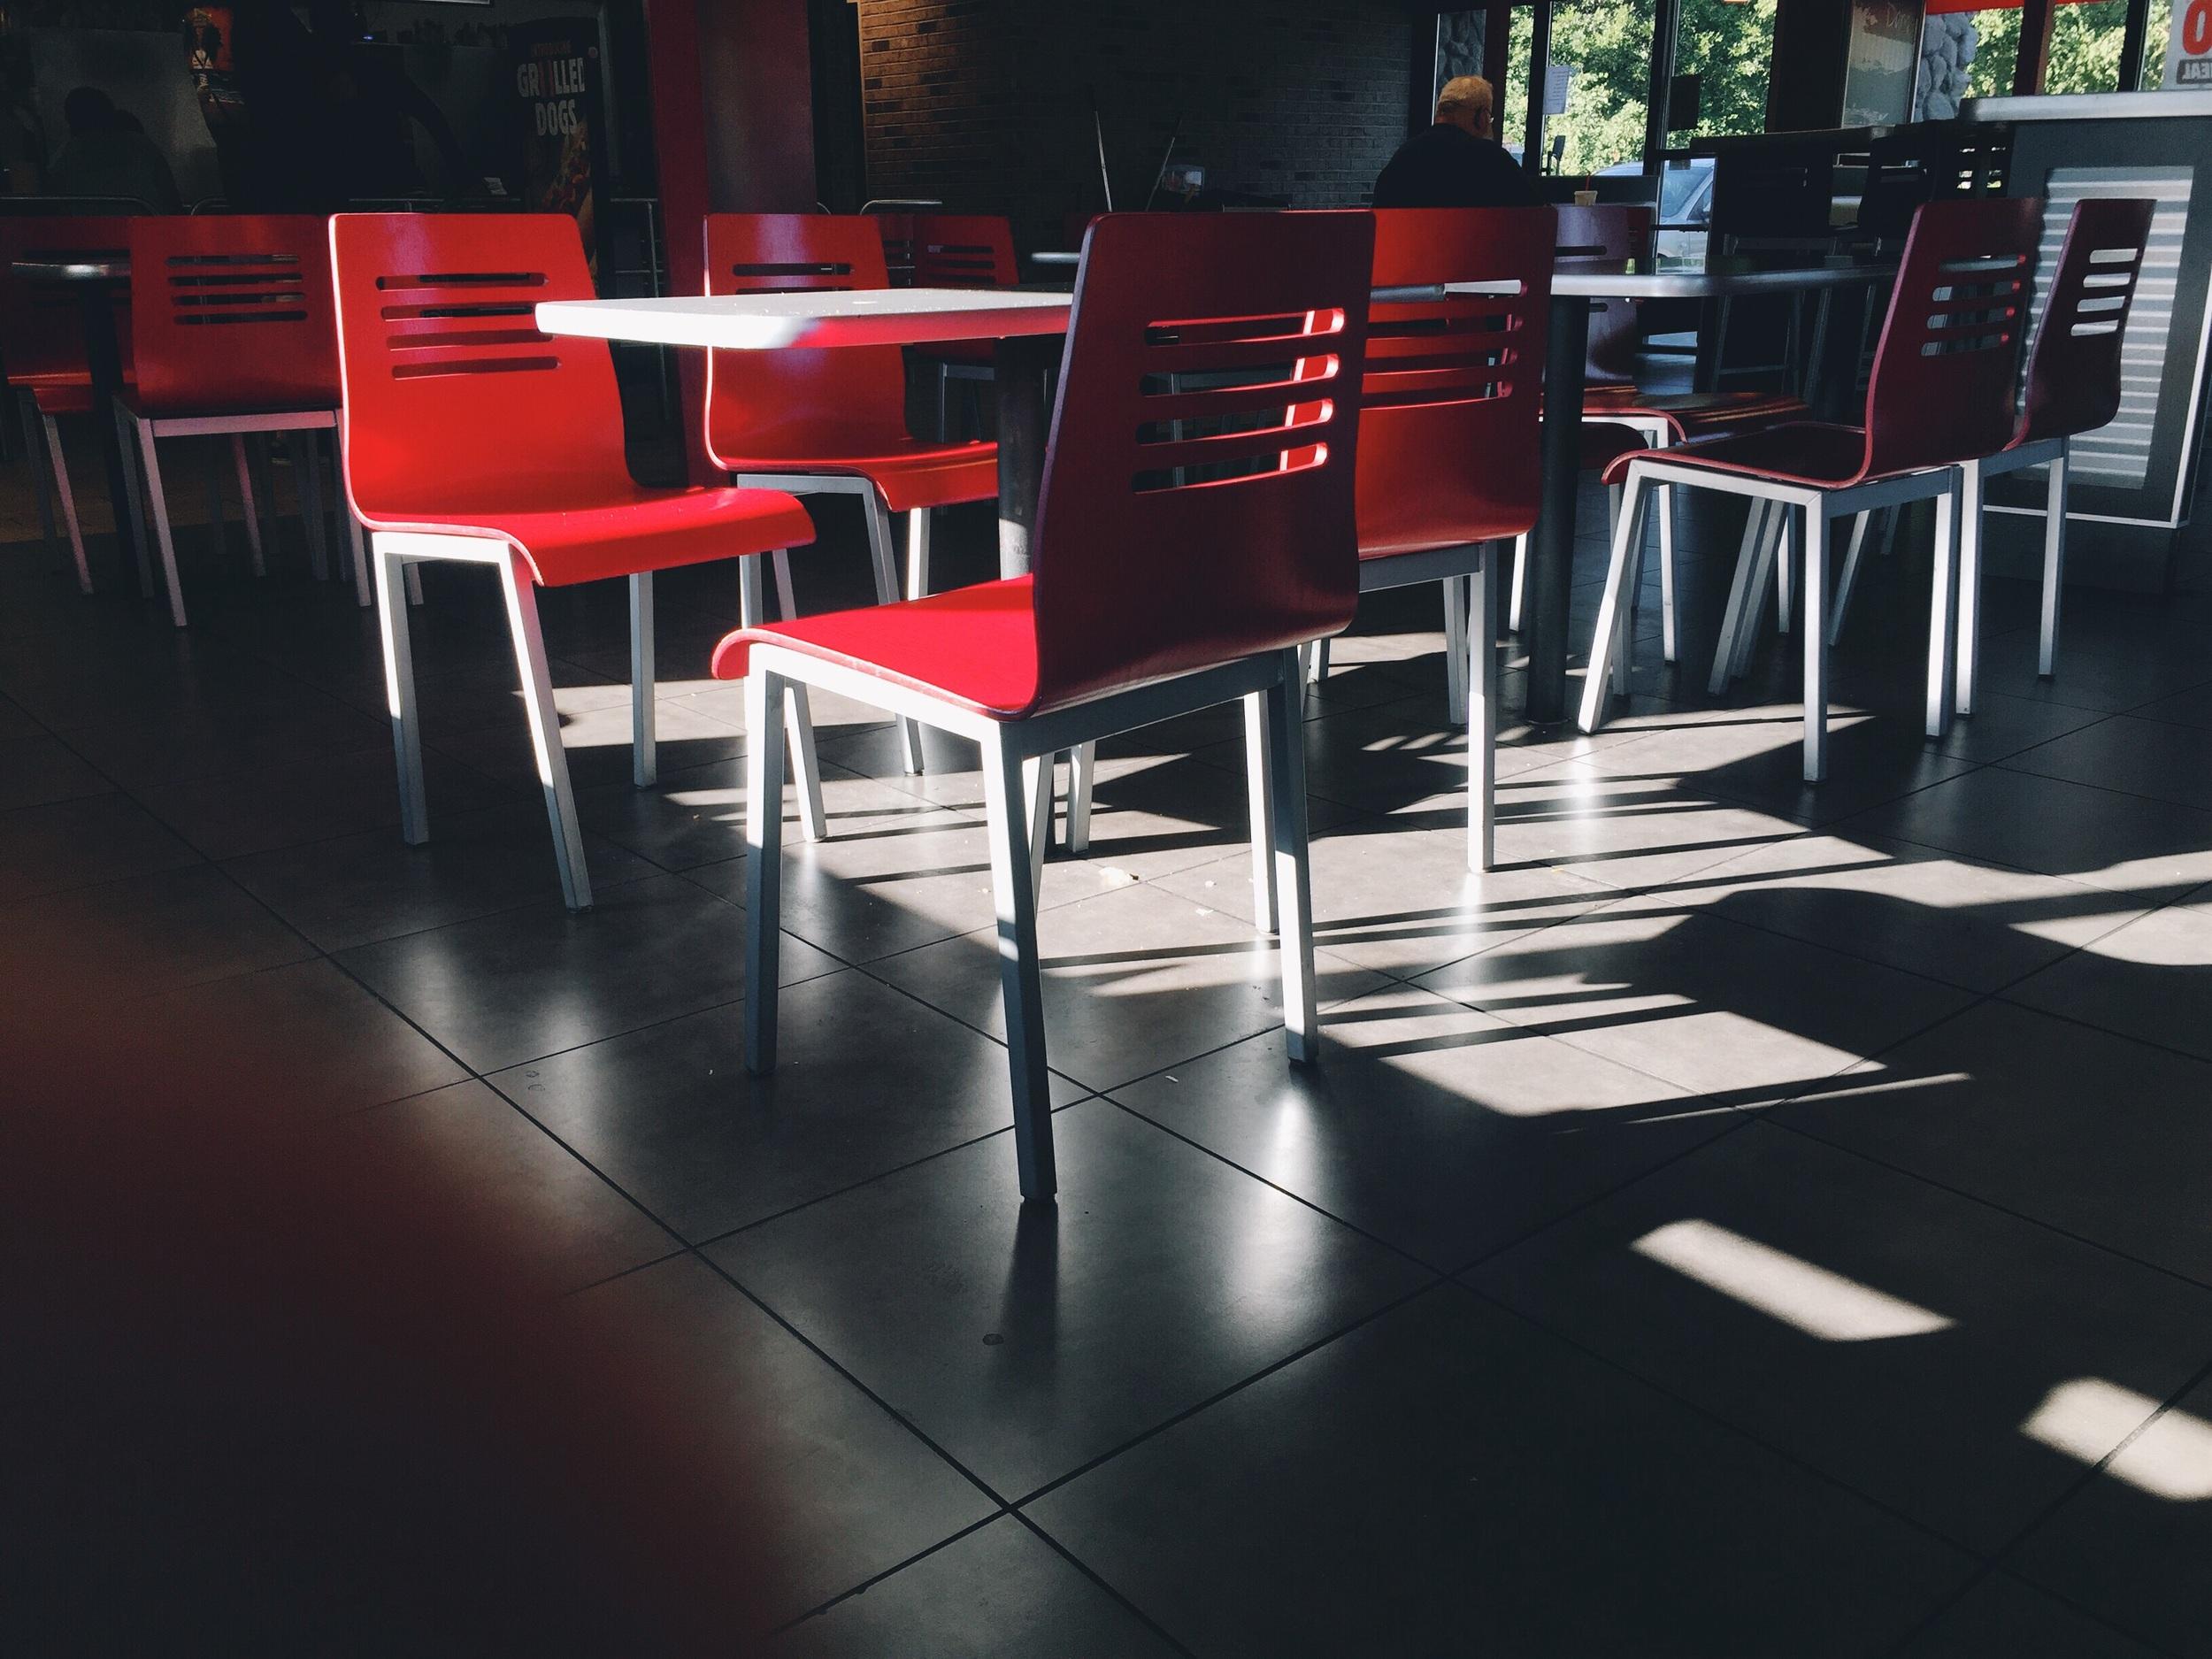 The nice Burger King.